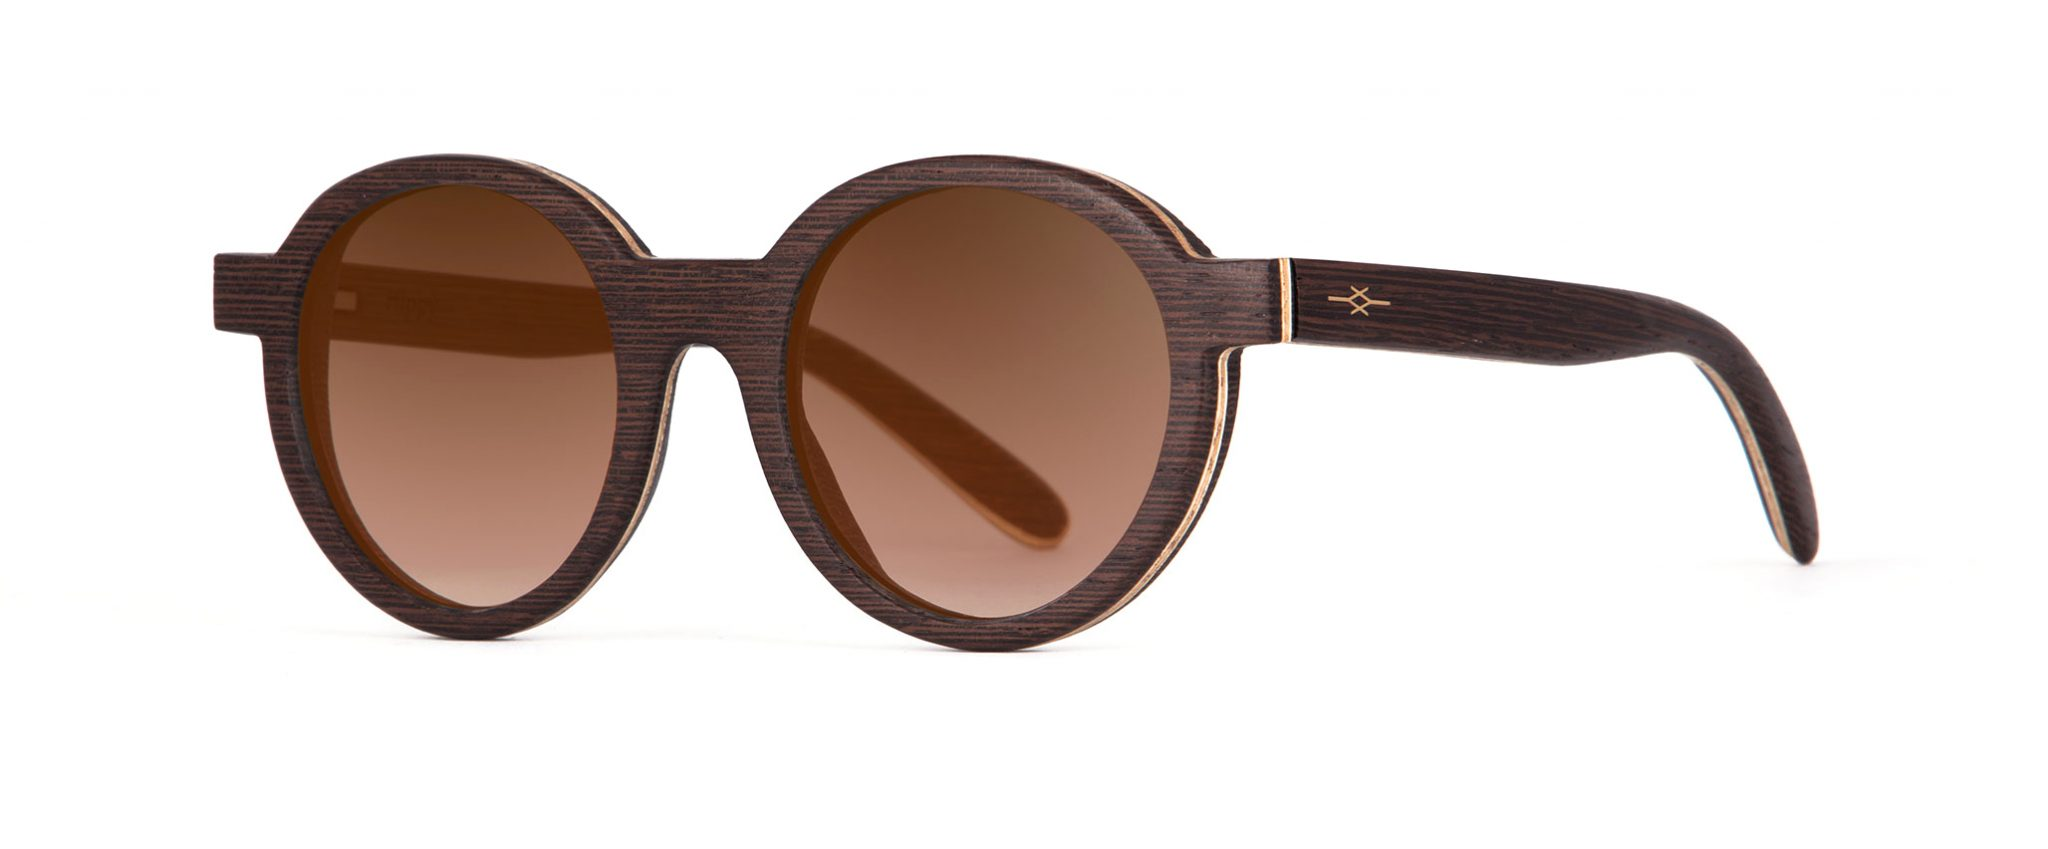 Hippy Wenge Round Designer Sunglasses VAKAY